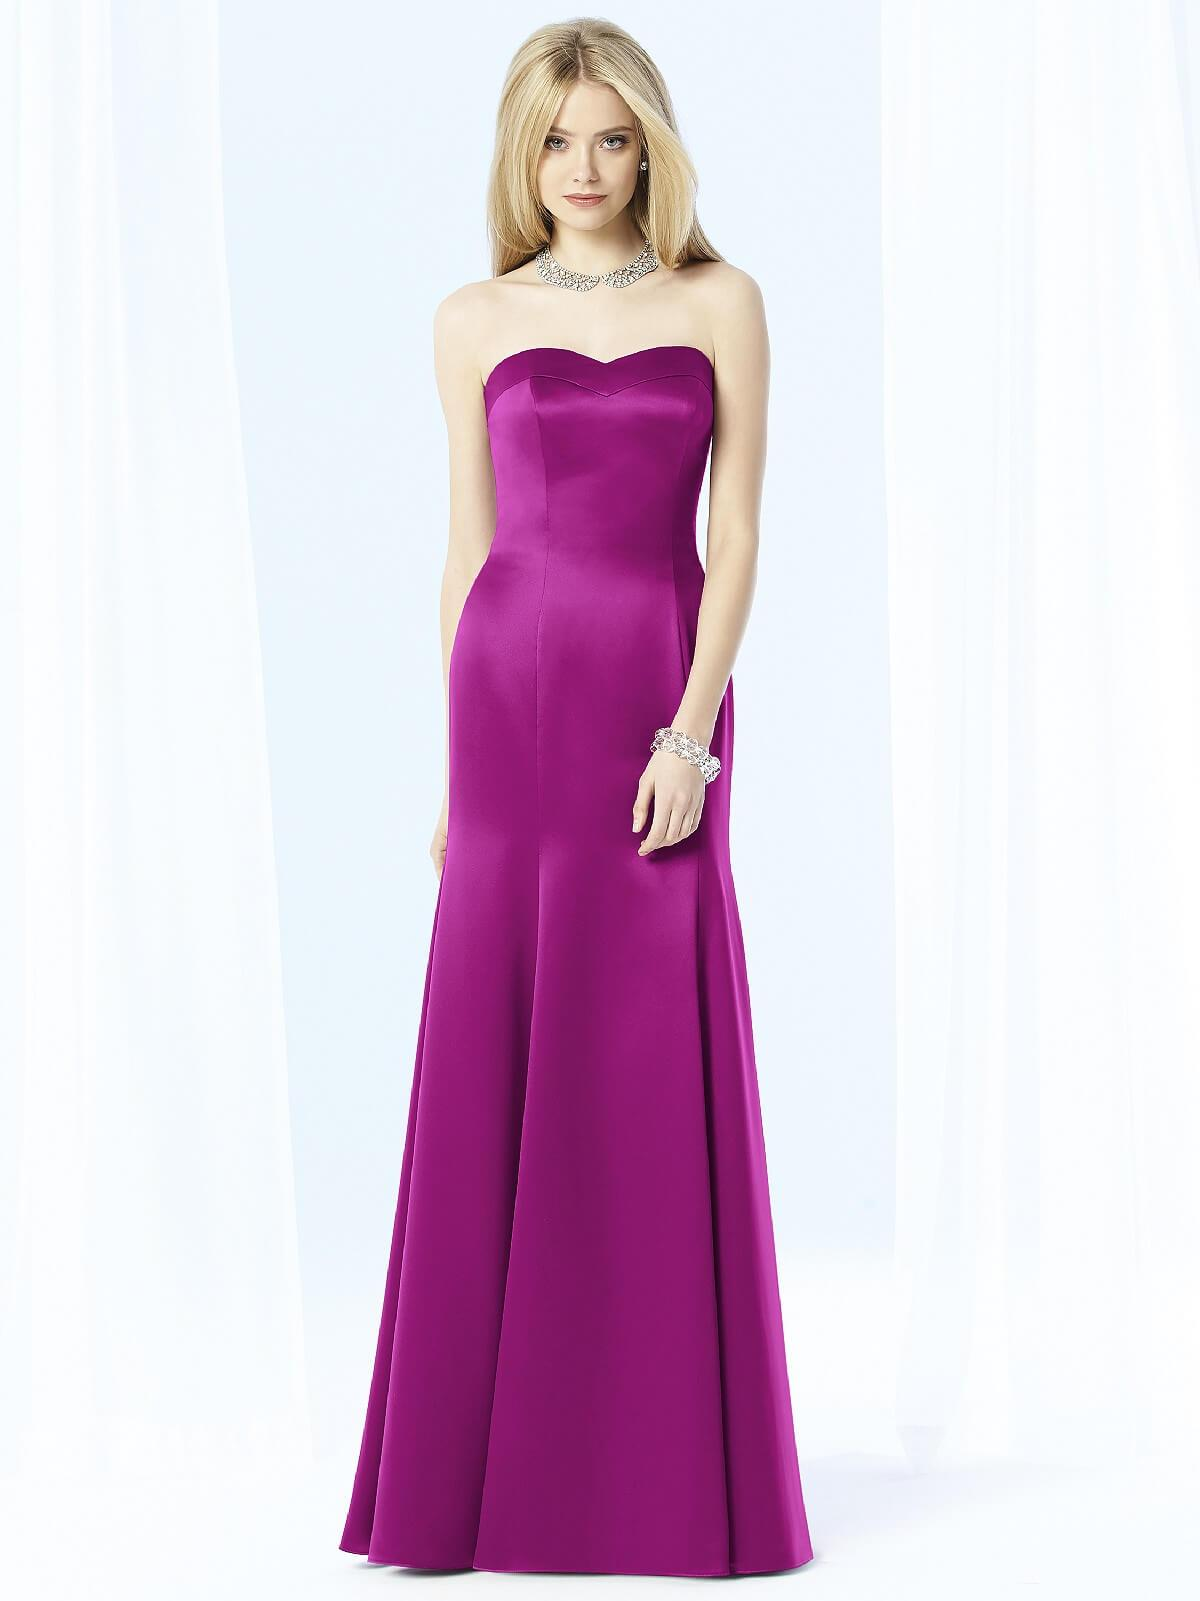 dolga_oprijeta_vecerna_pink_obleka